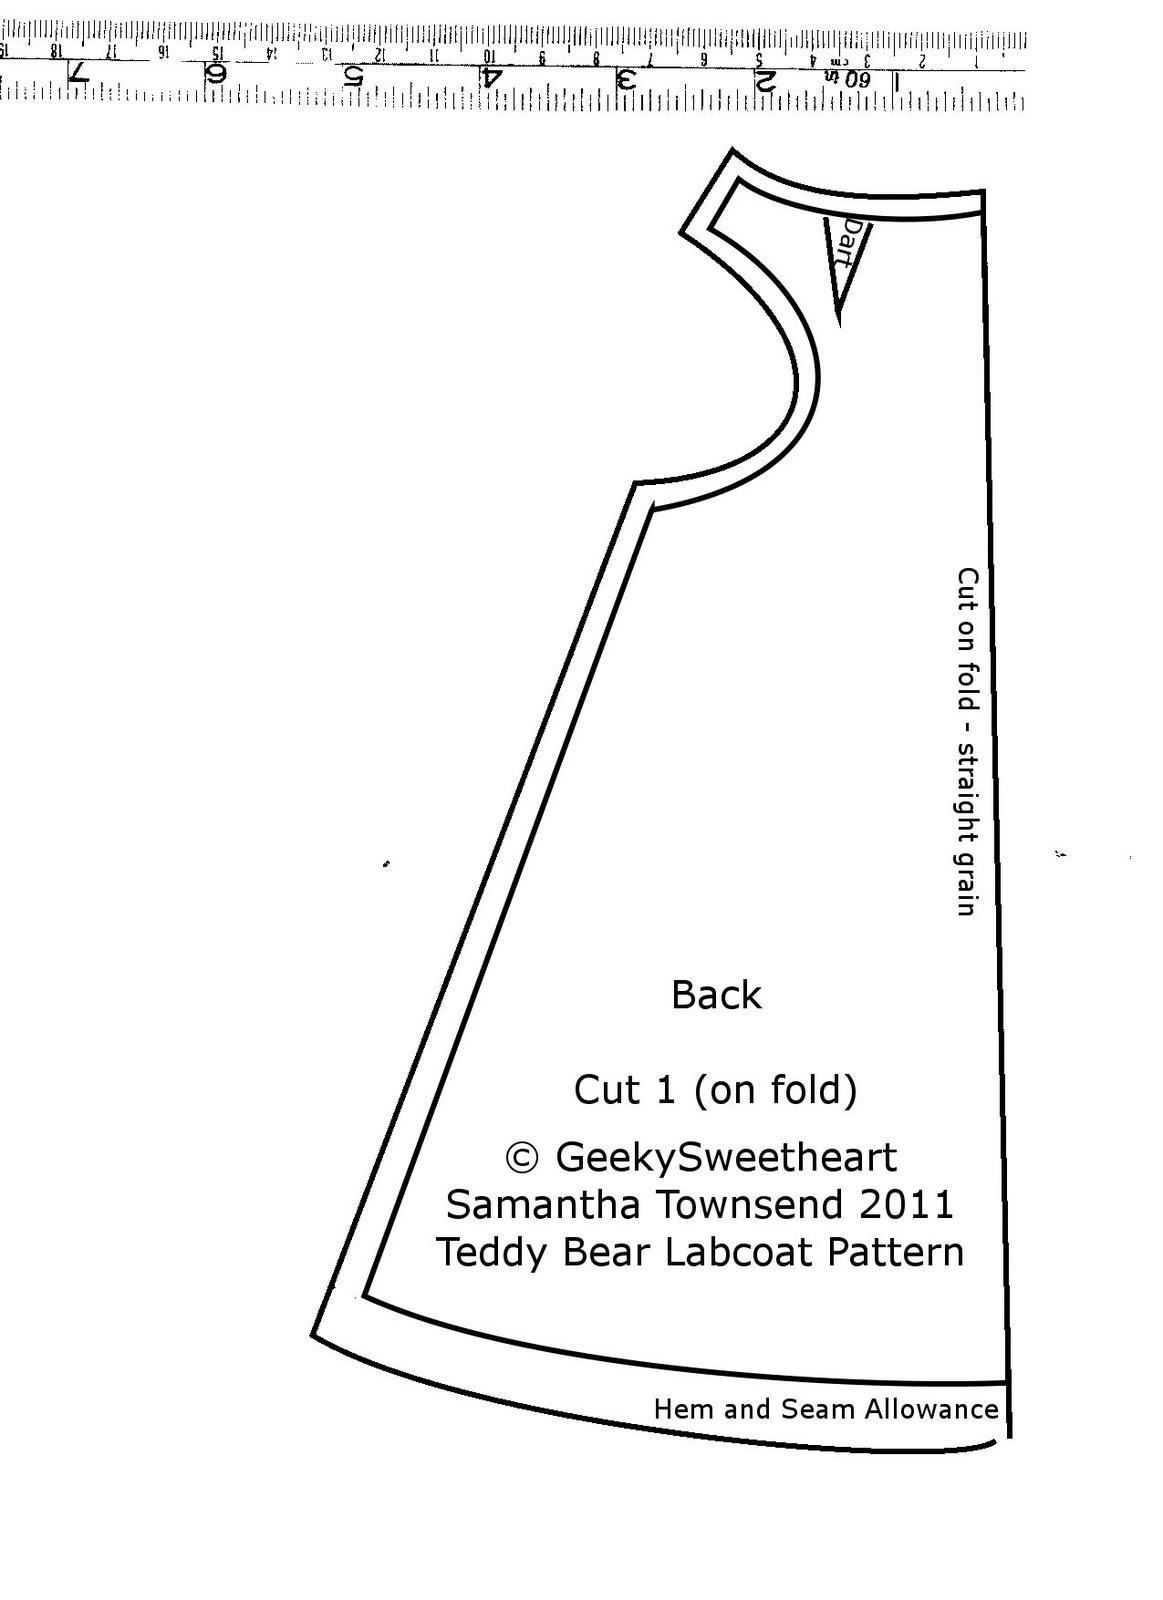 Teddy bear sewing pattern free gallery craft decoration ideas printable teddy bear sewing pattern gallery craft decoration ideas teddy bear sewing patterns free printables gallery jeuxipadfo Images